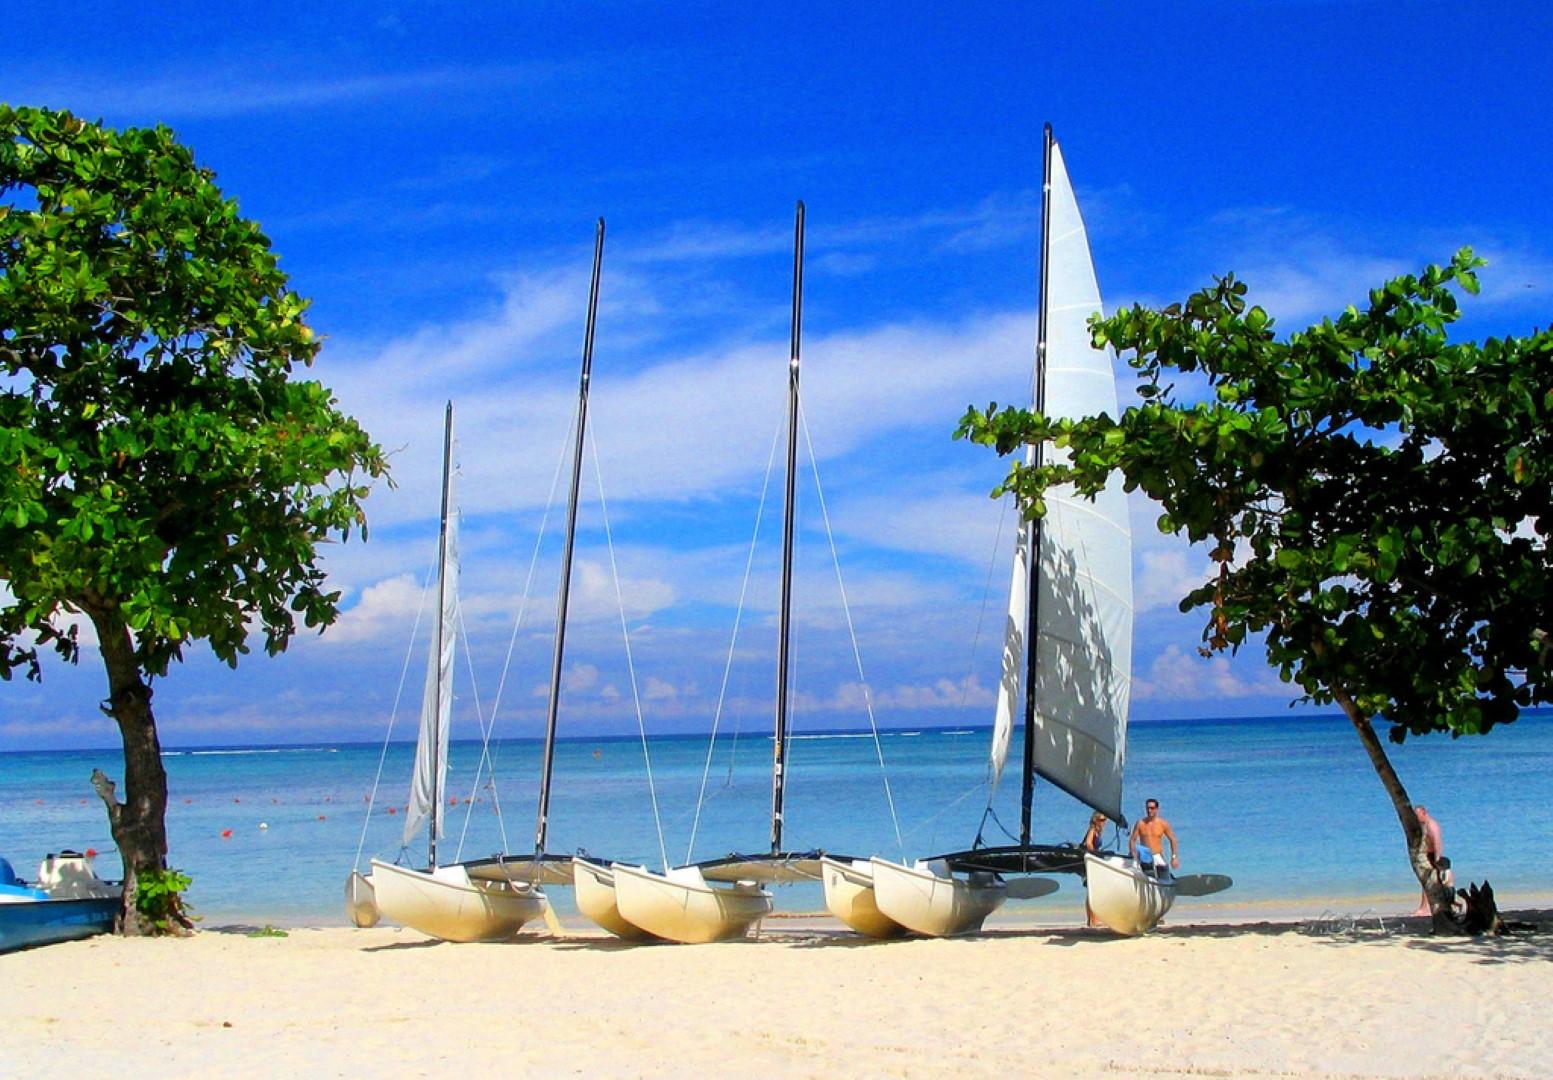 Catamarans on the beach at Cayo Levisa, Cuba